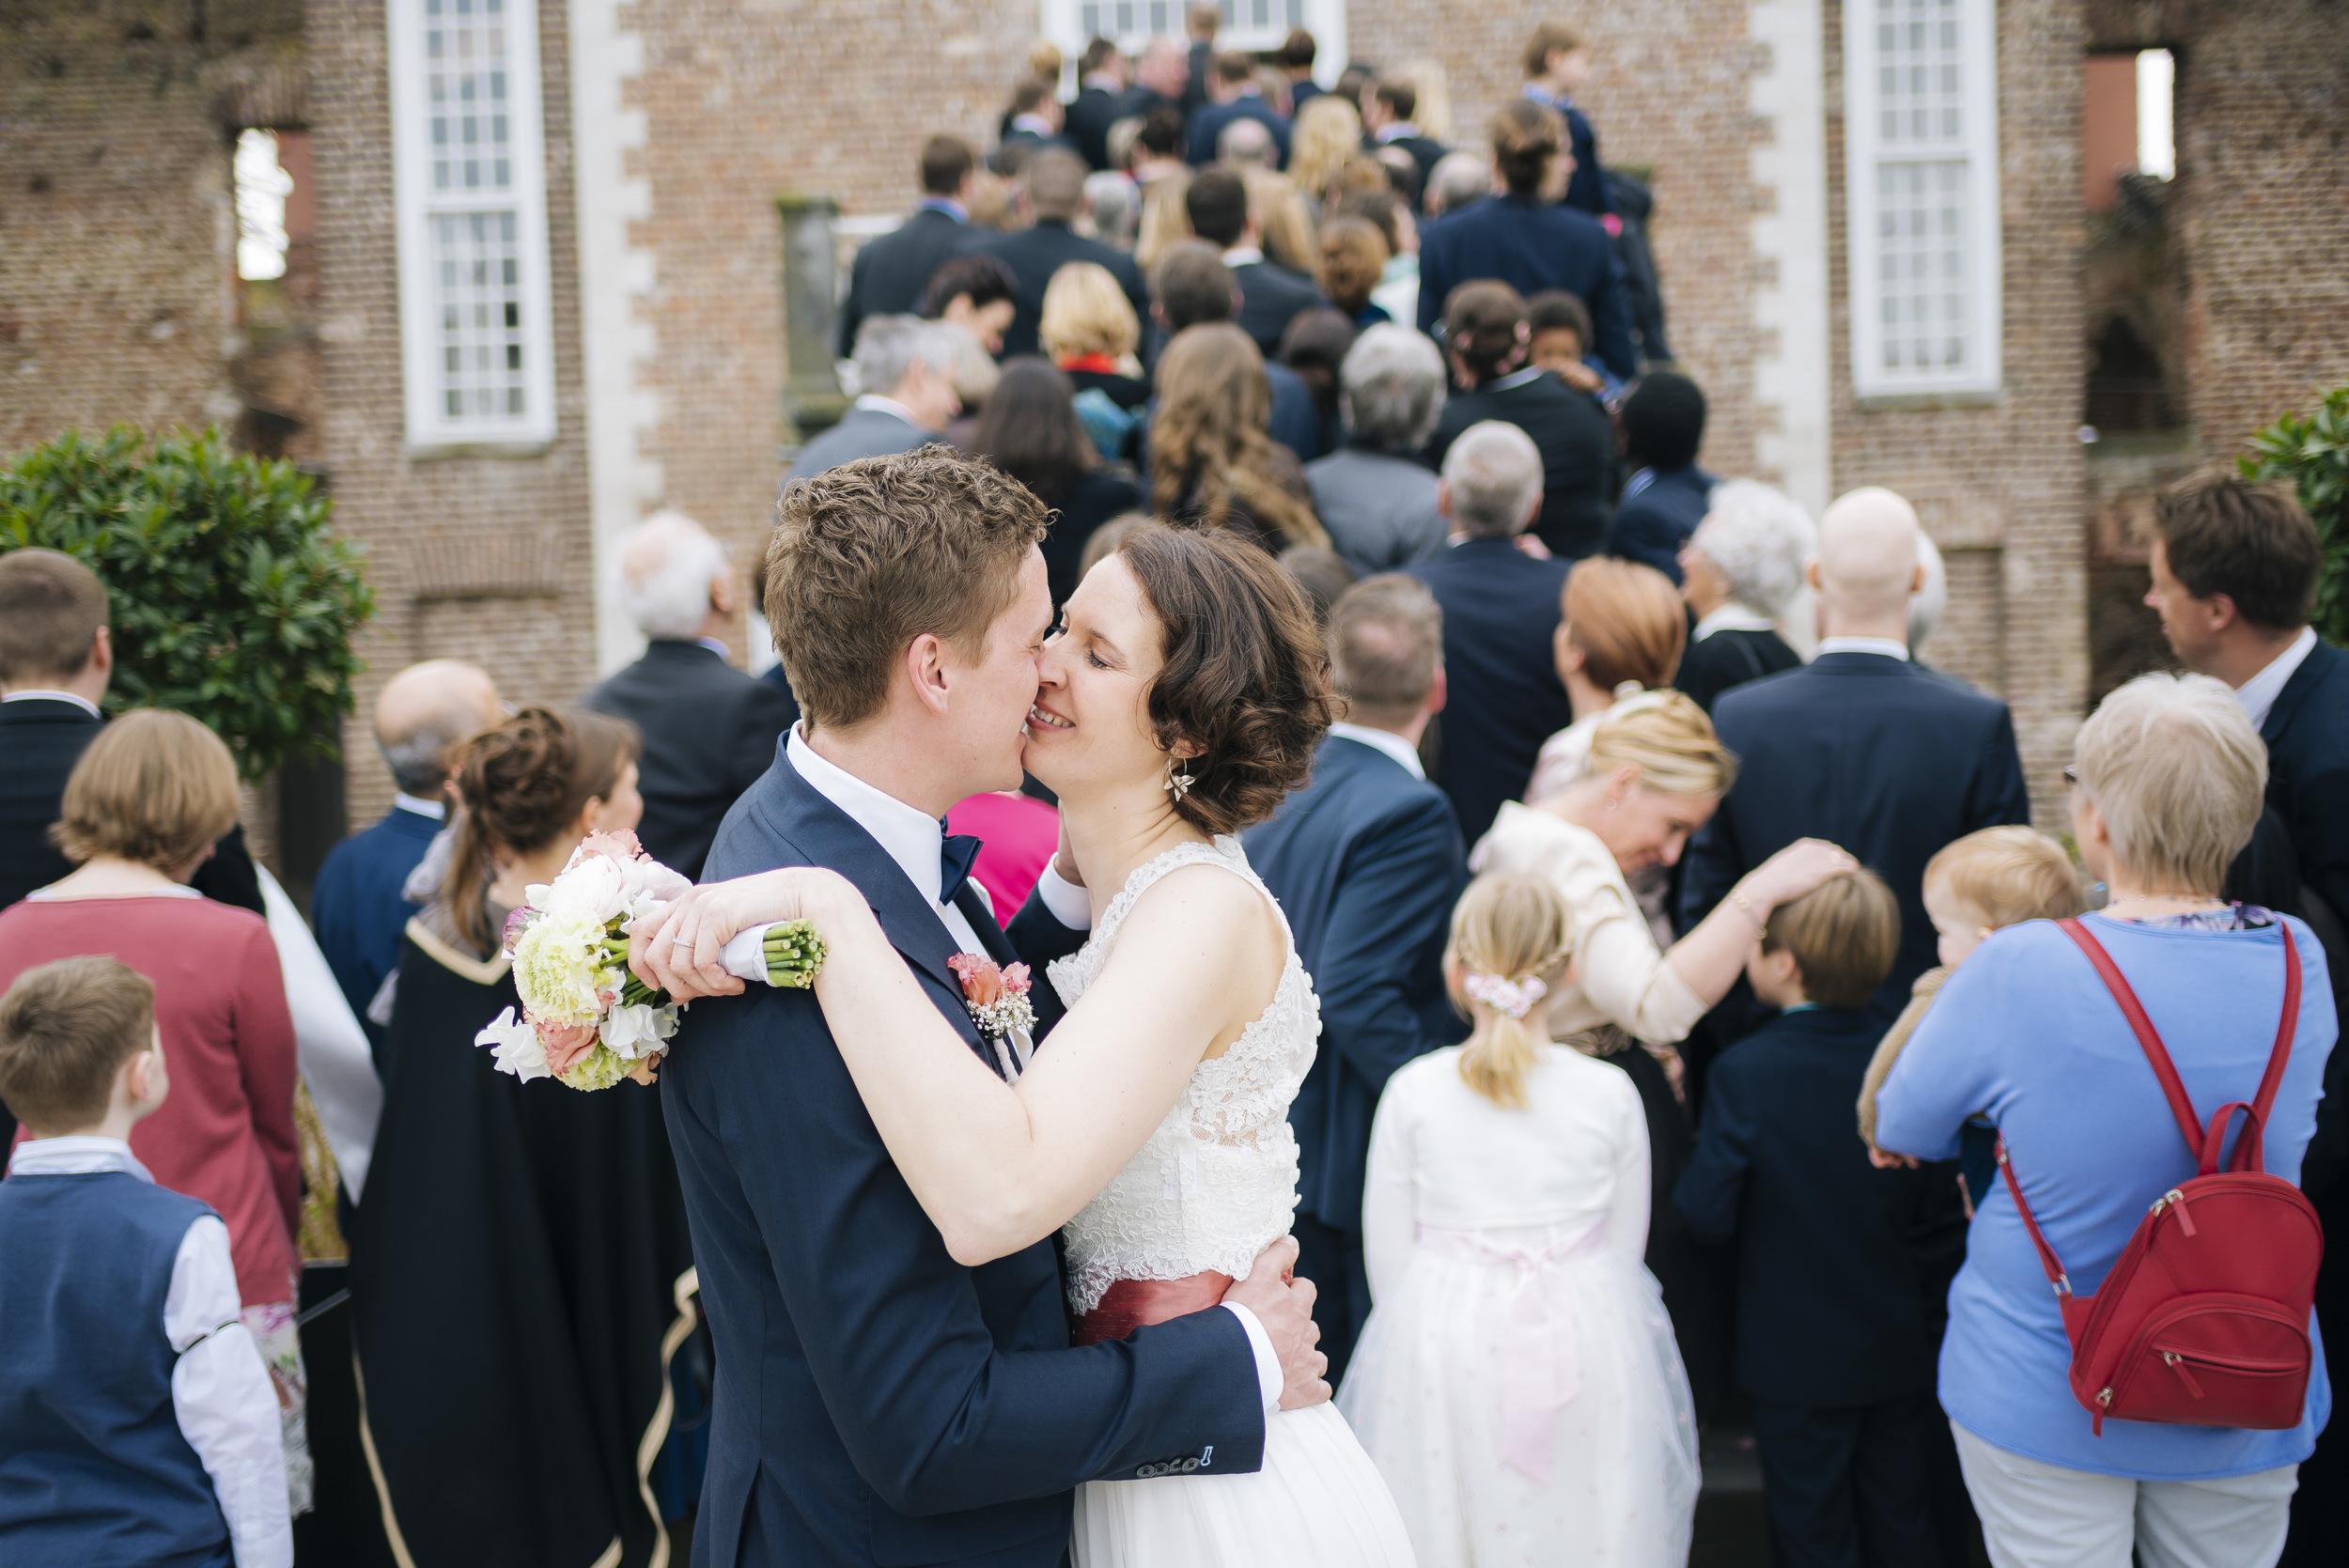 Hochzeitsfotograf-Schlossruine-Hertefeld-Weeze-104.jpg